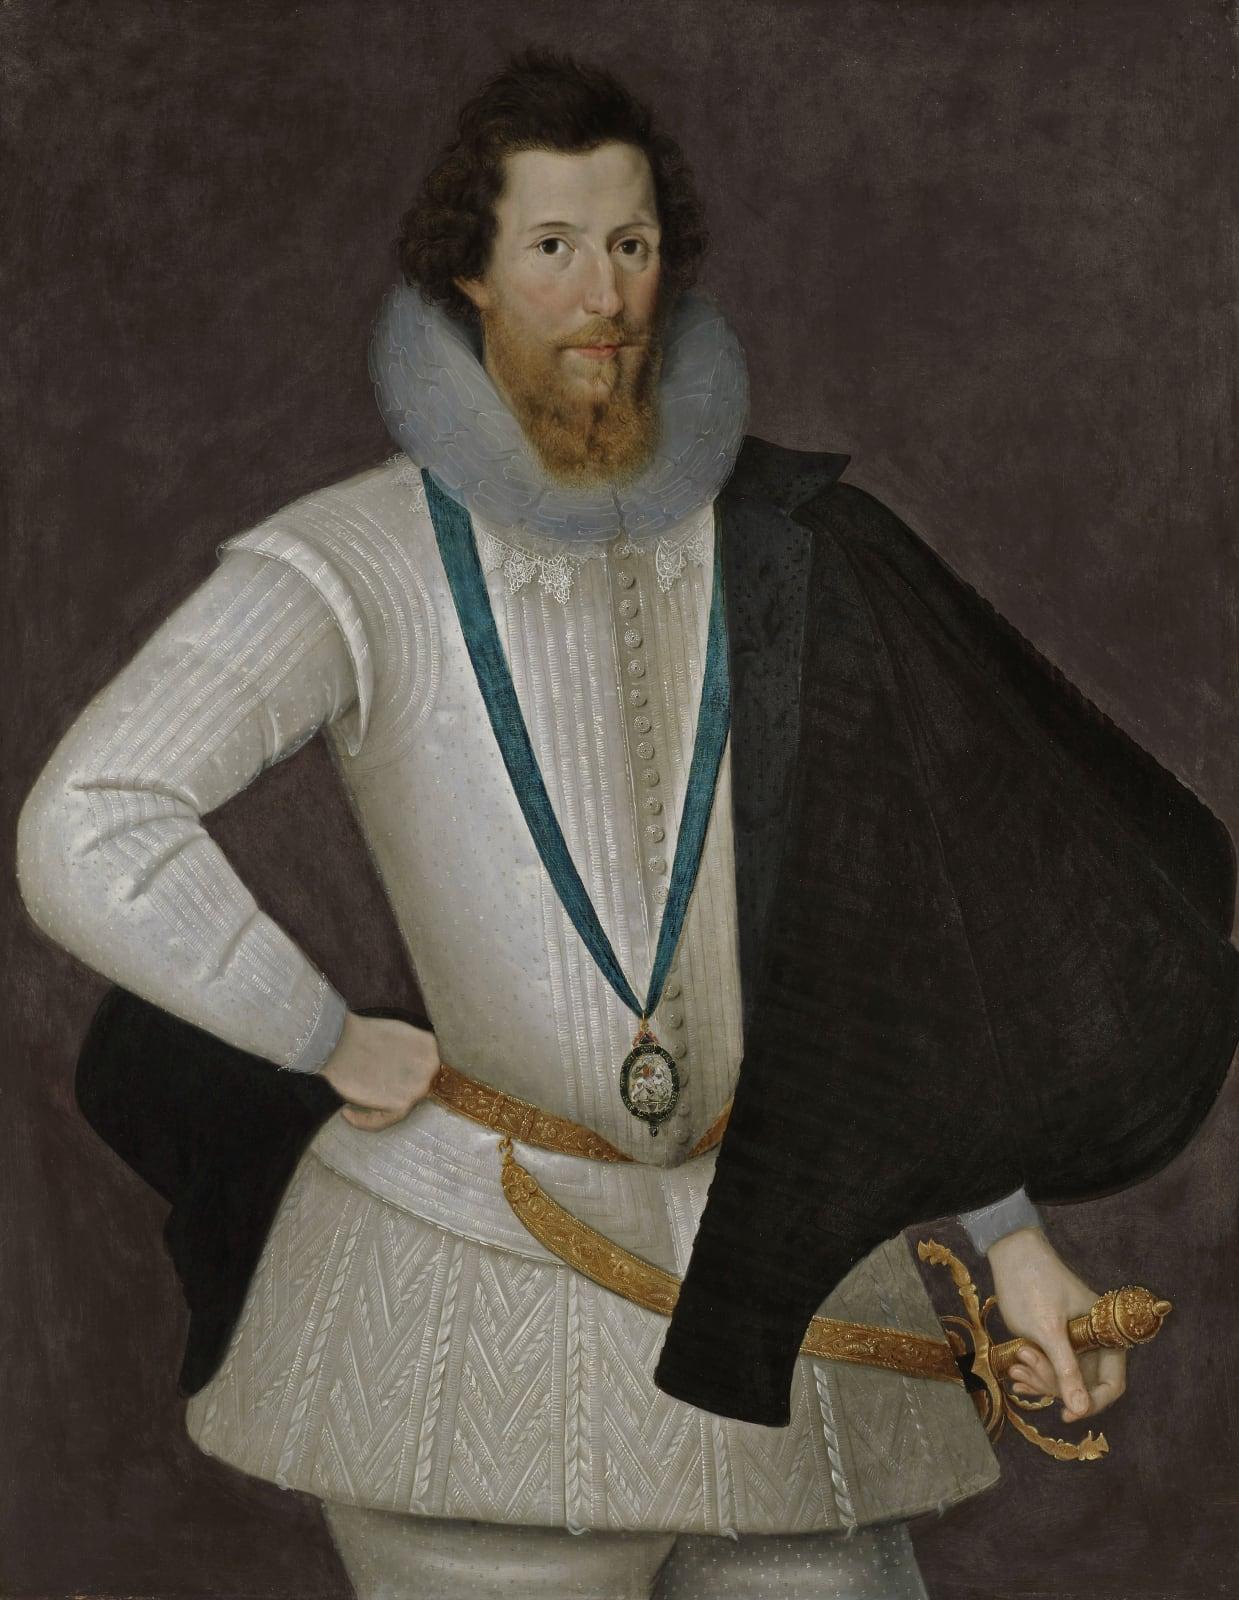 Robert Devereux, 2nd Earl of Essex (1565 – 1601)